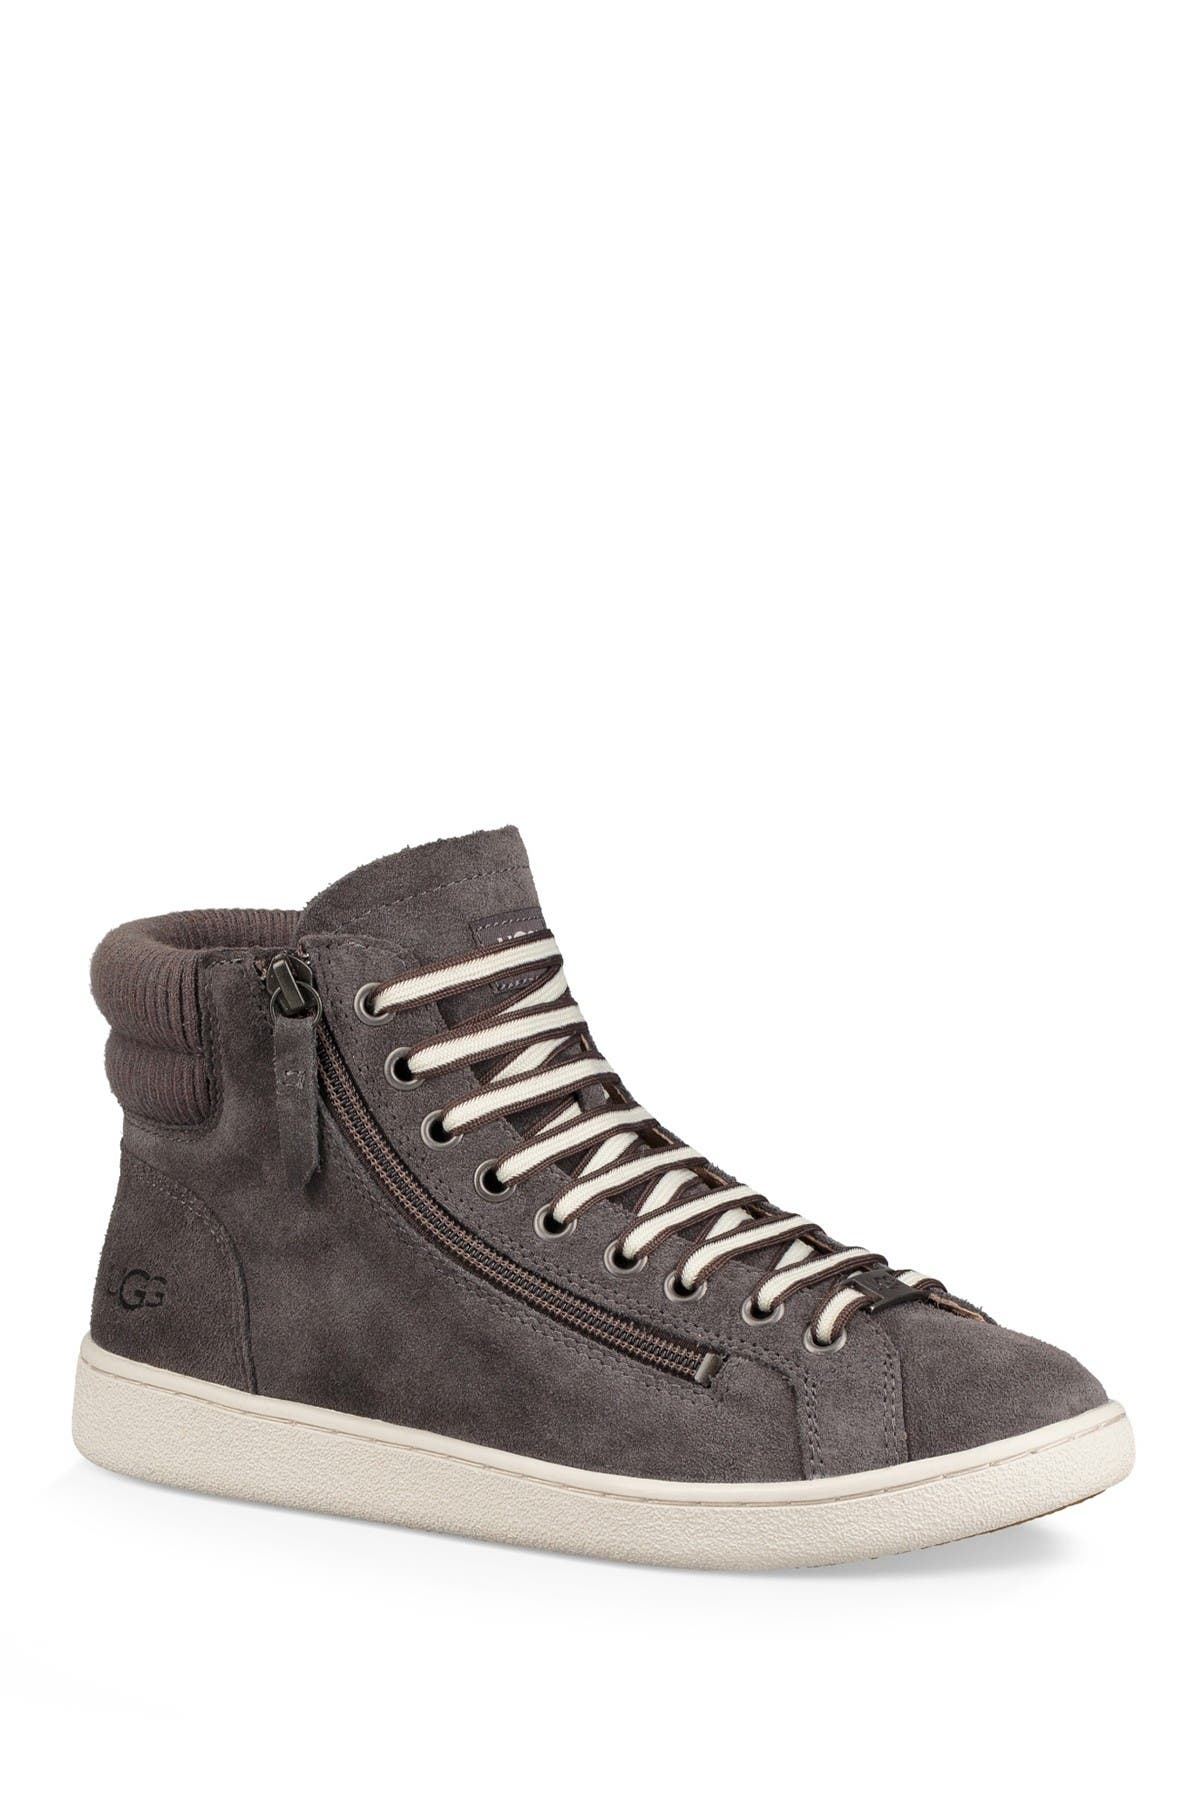 UGG | Olive High Top Sneaker